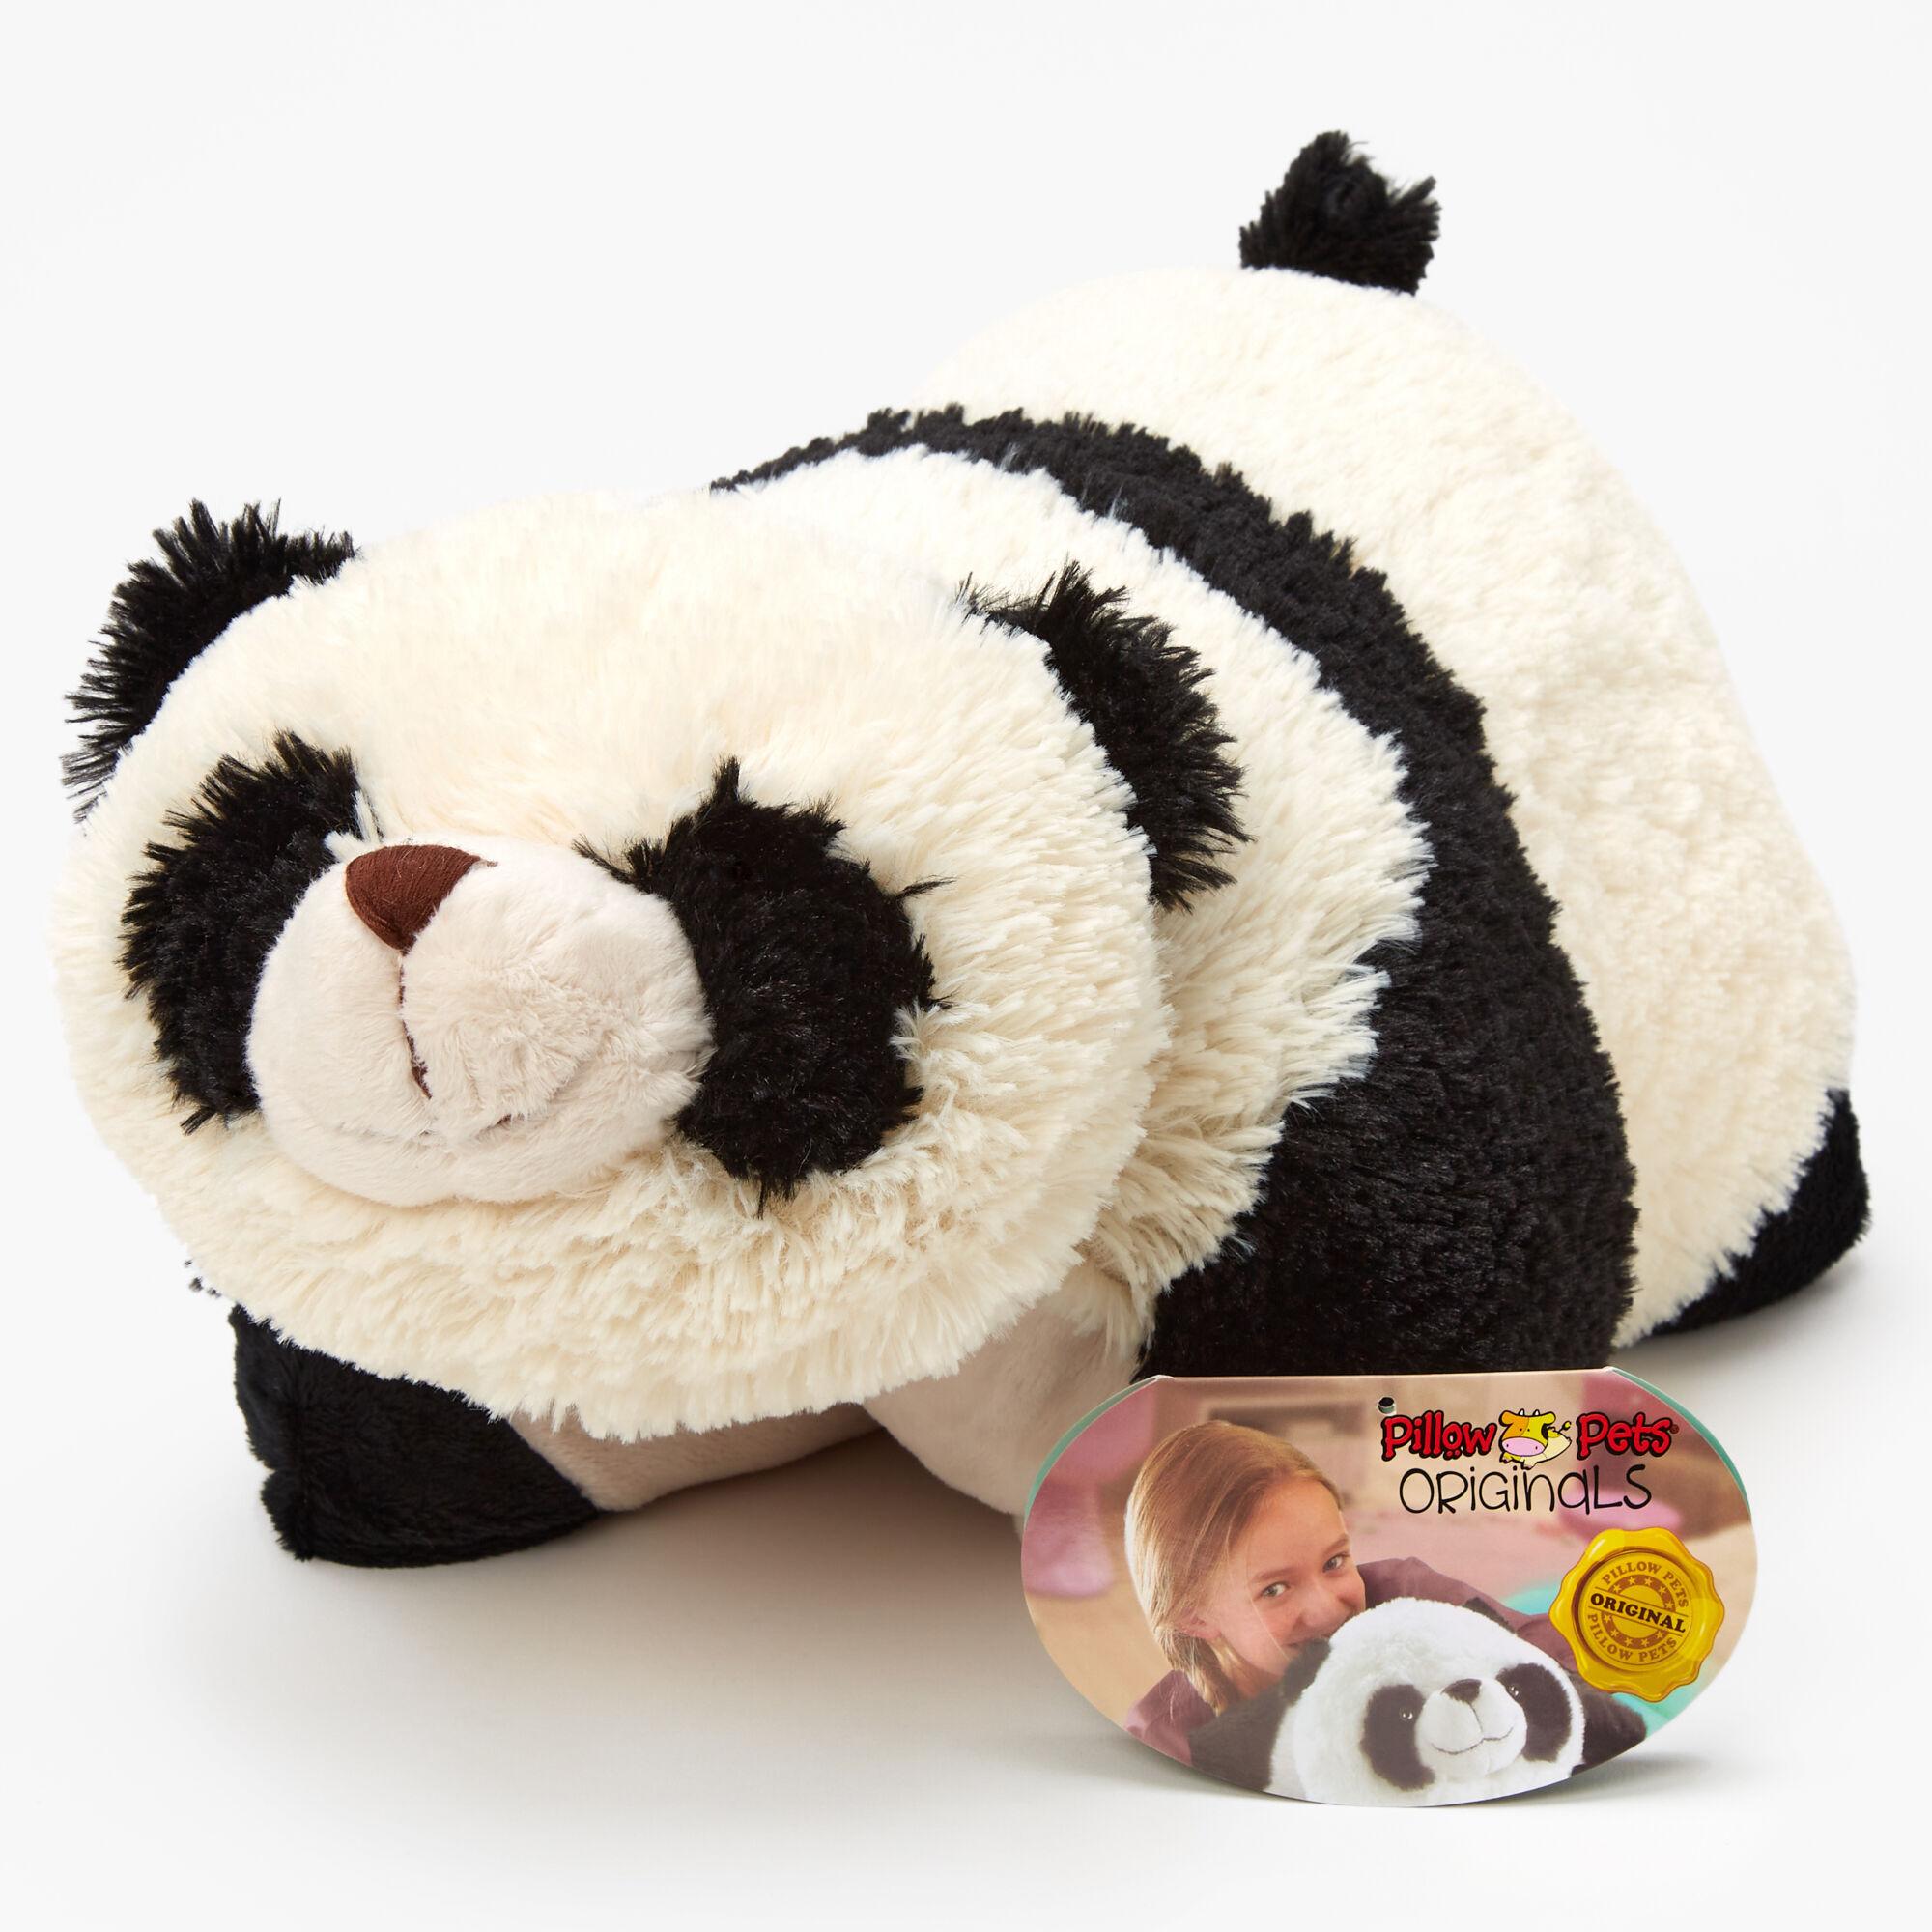 pillow pets originals black and white panda plush toy